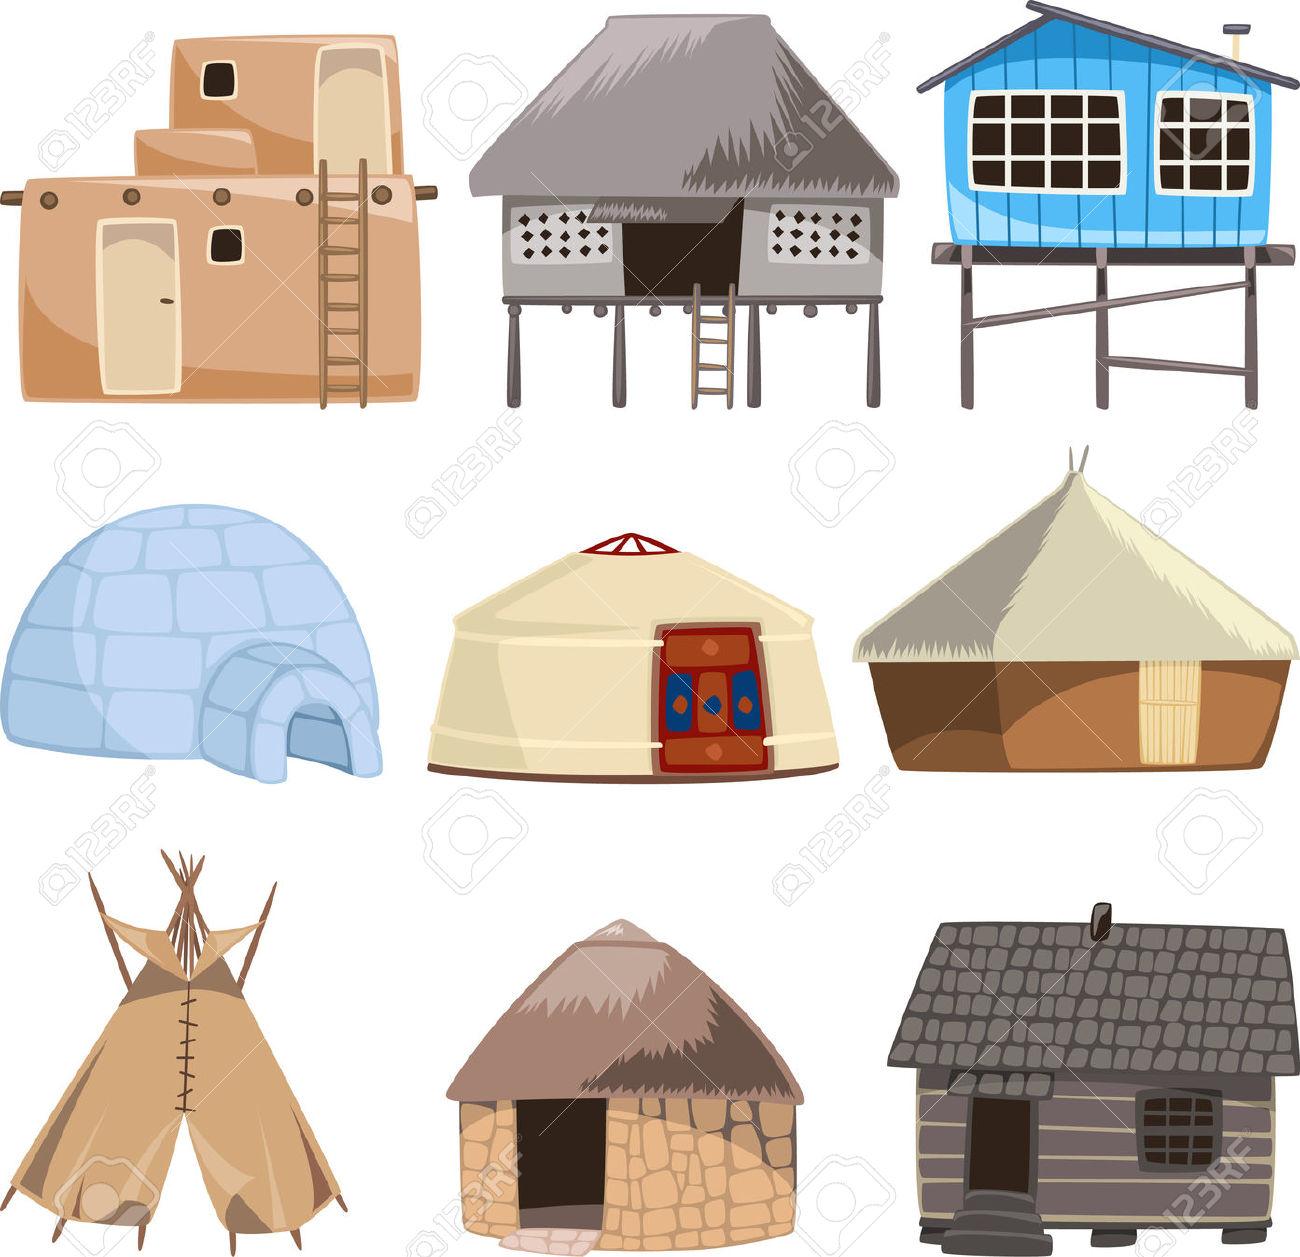 Set Of Traditional Housed. With House, Igloo, Hut, Shack, Slum.